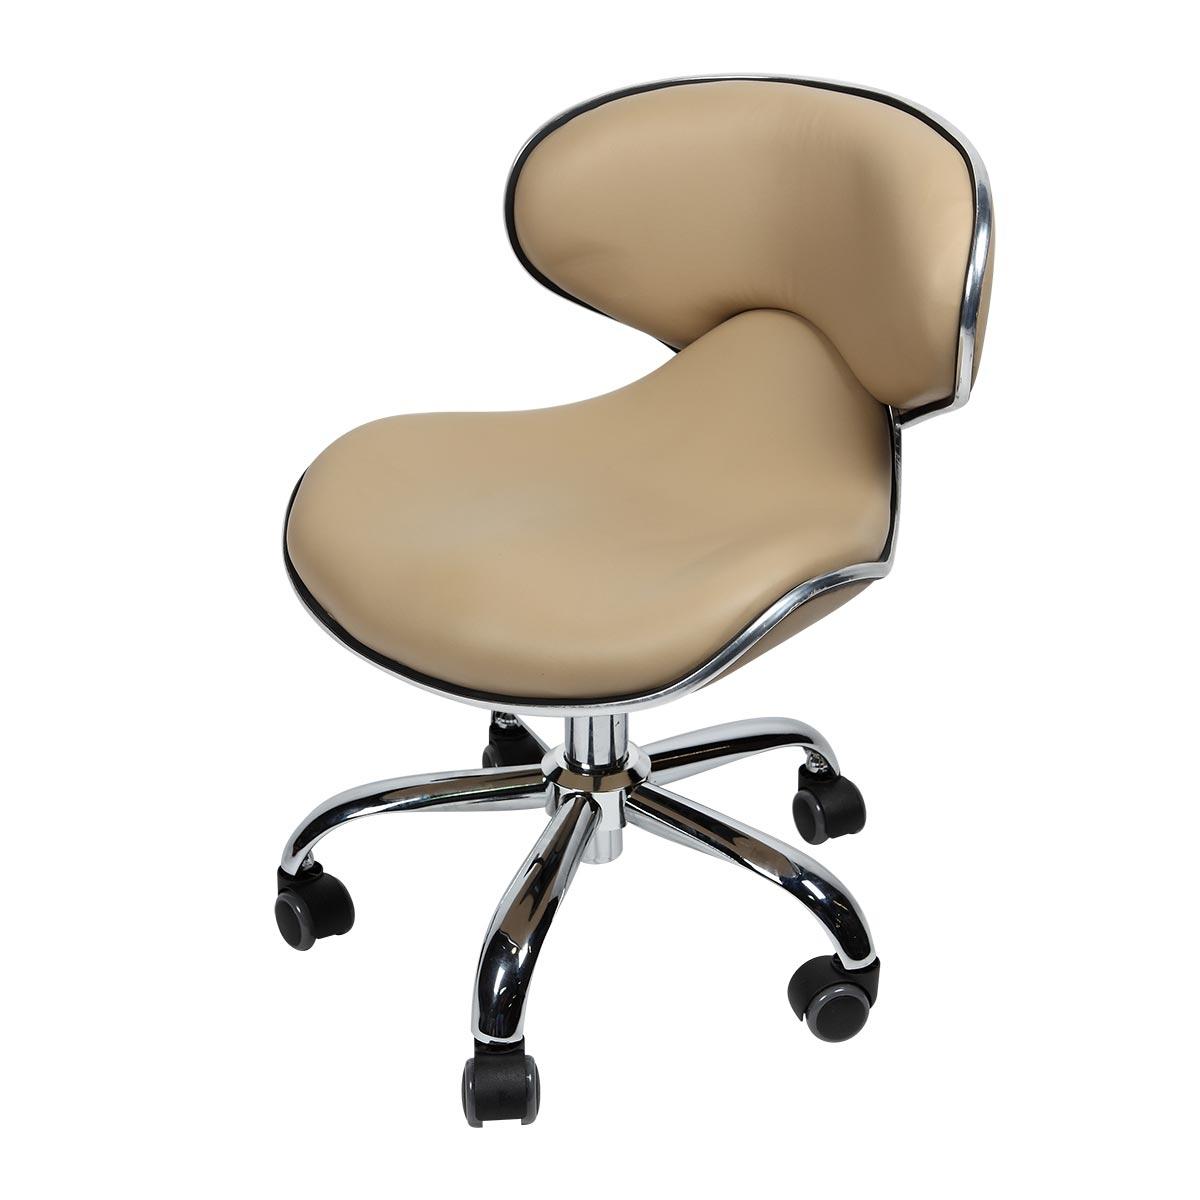 nail salon pedicure stool for salemodern technician chair